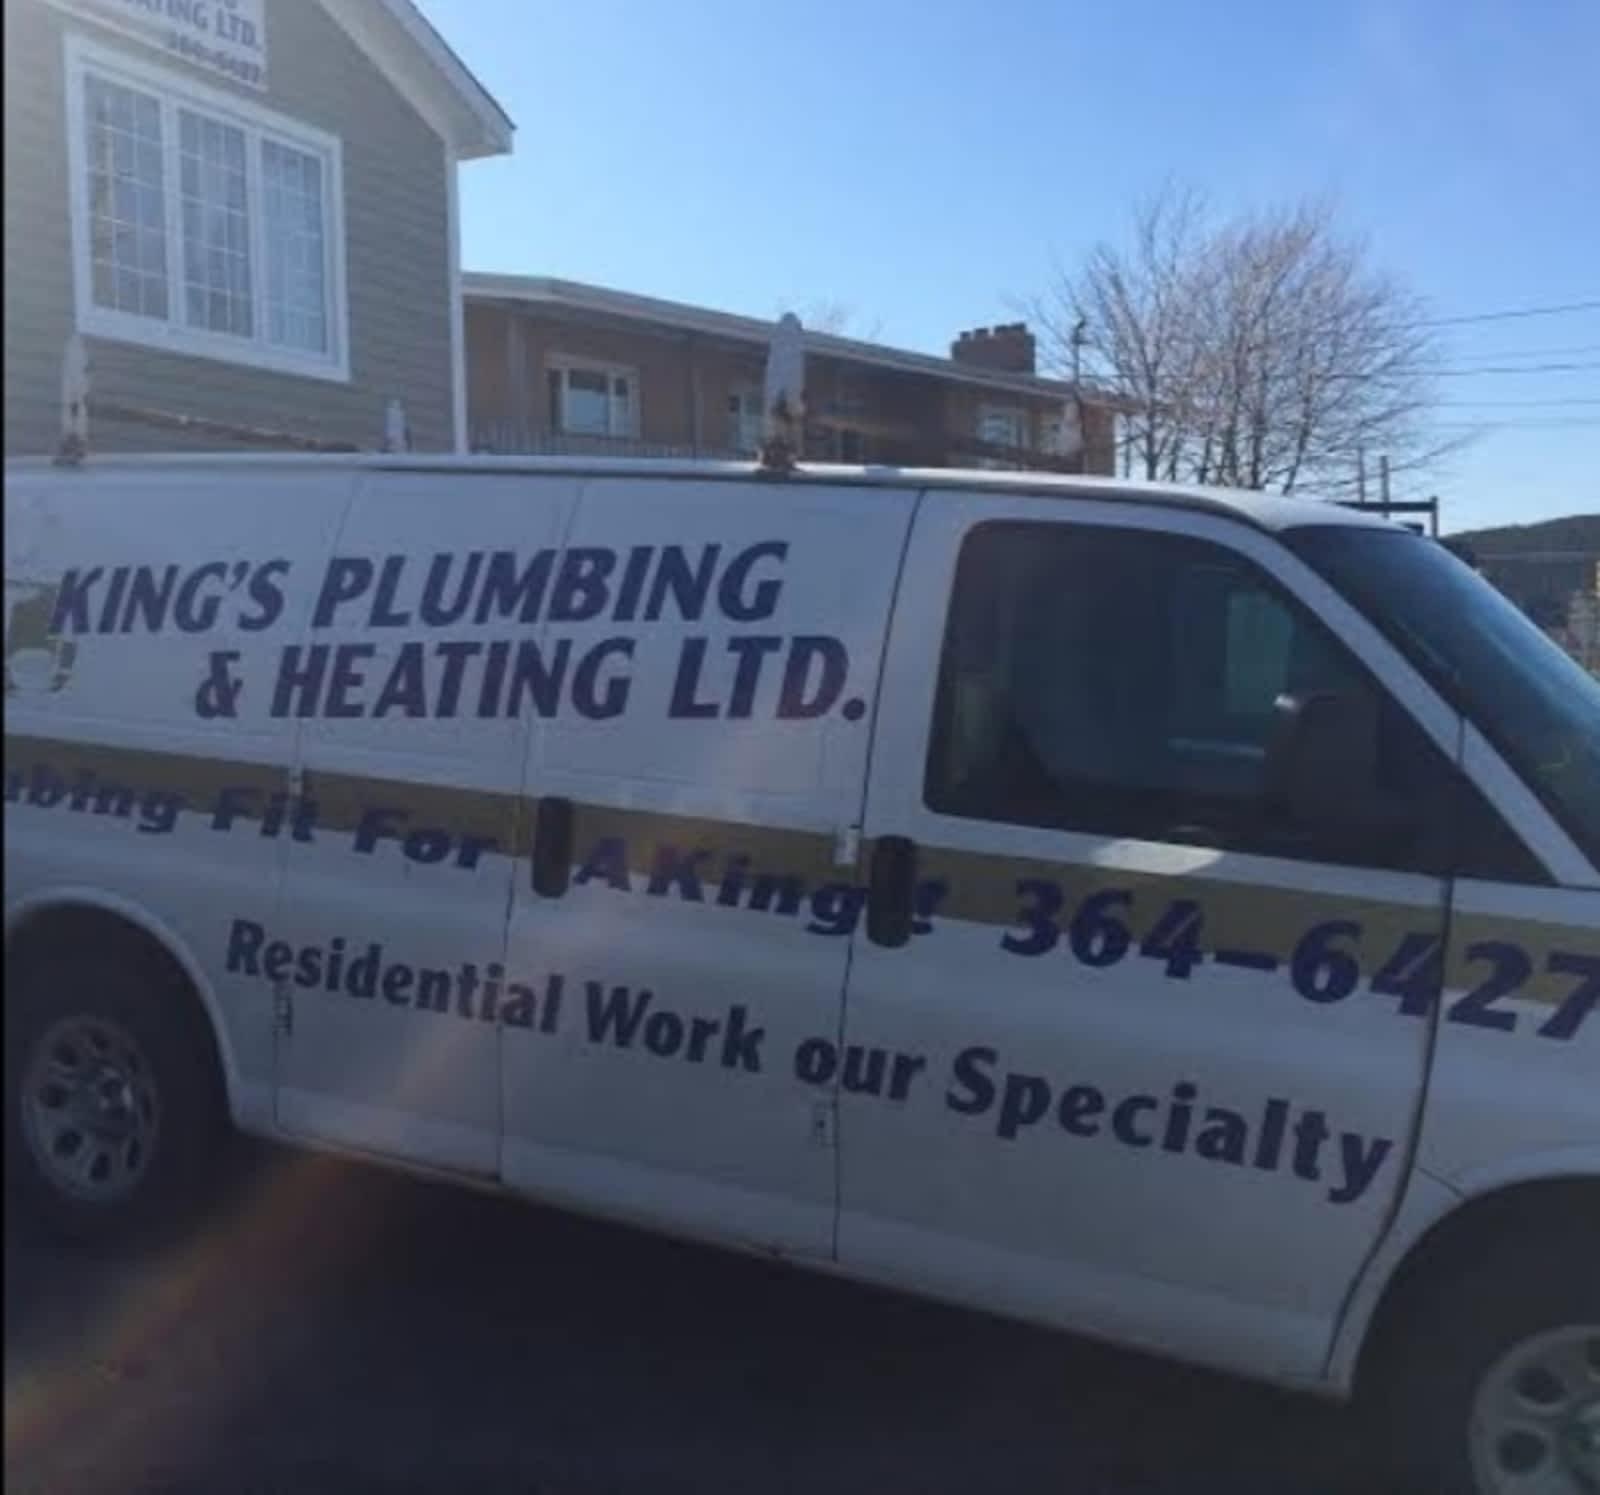 full atherton gas main service plumbing companies group repairs image drains water near a me shot